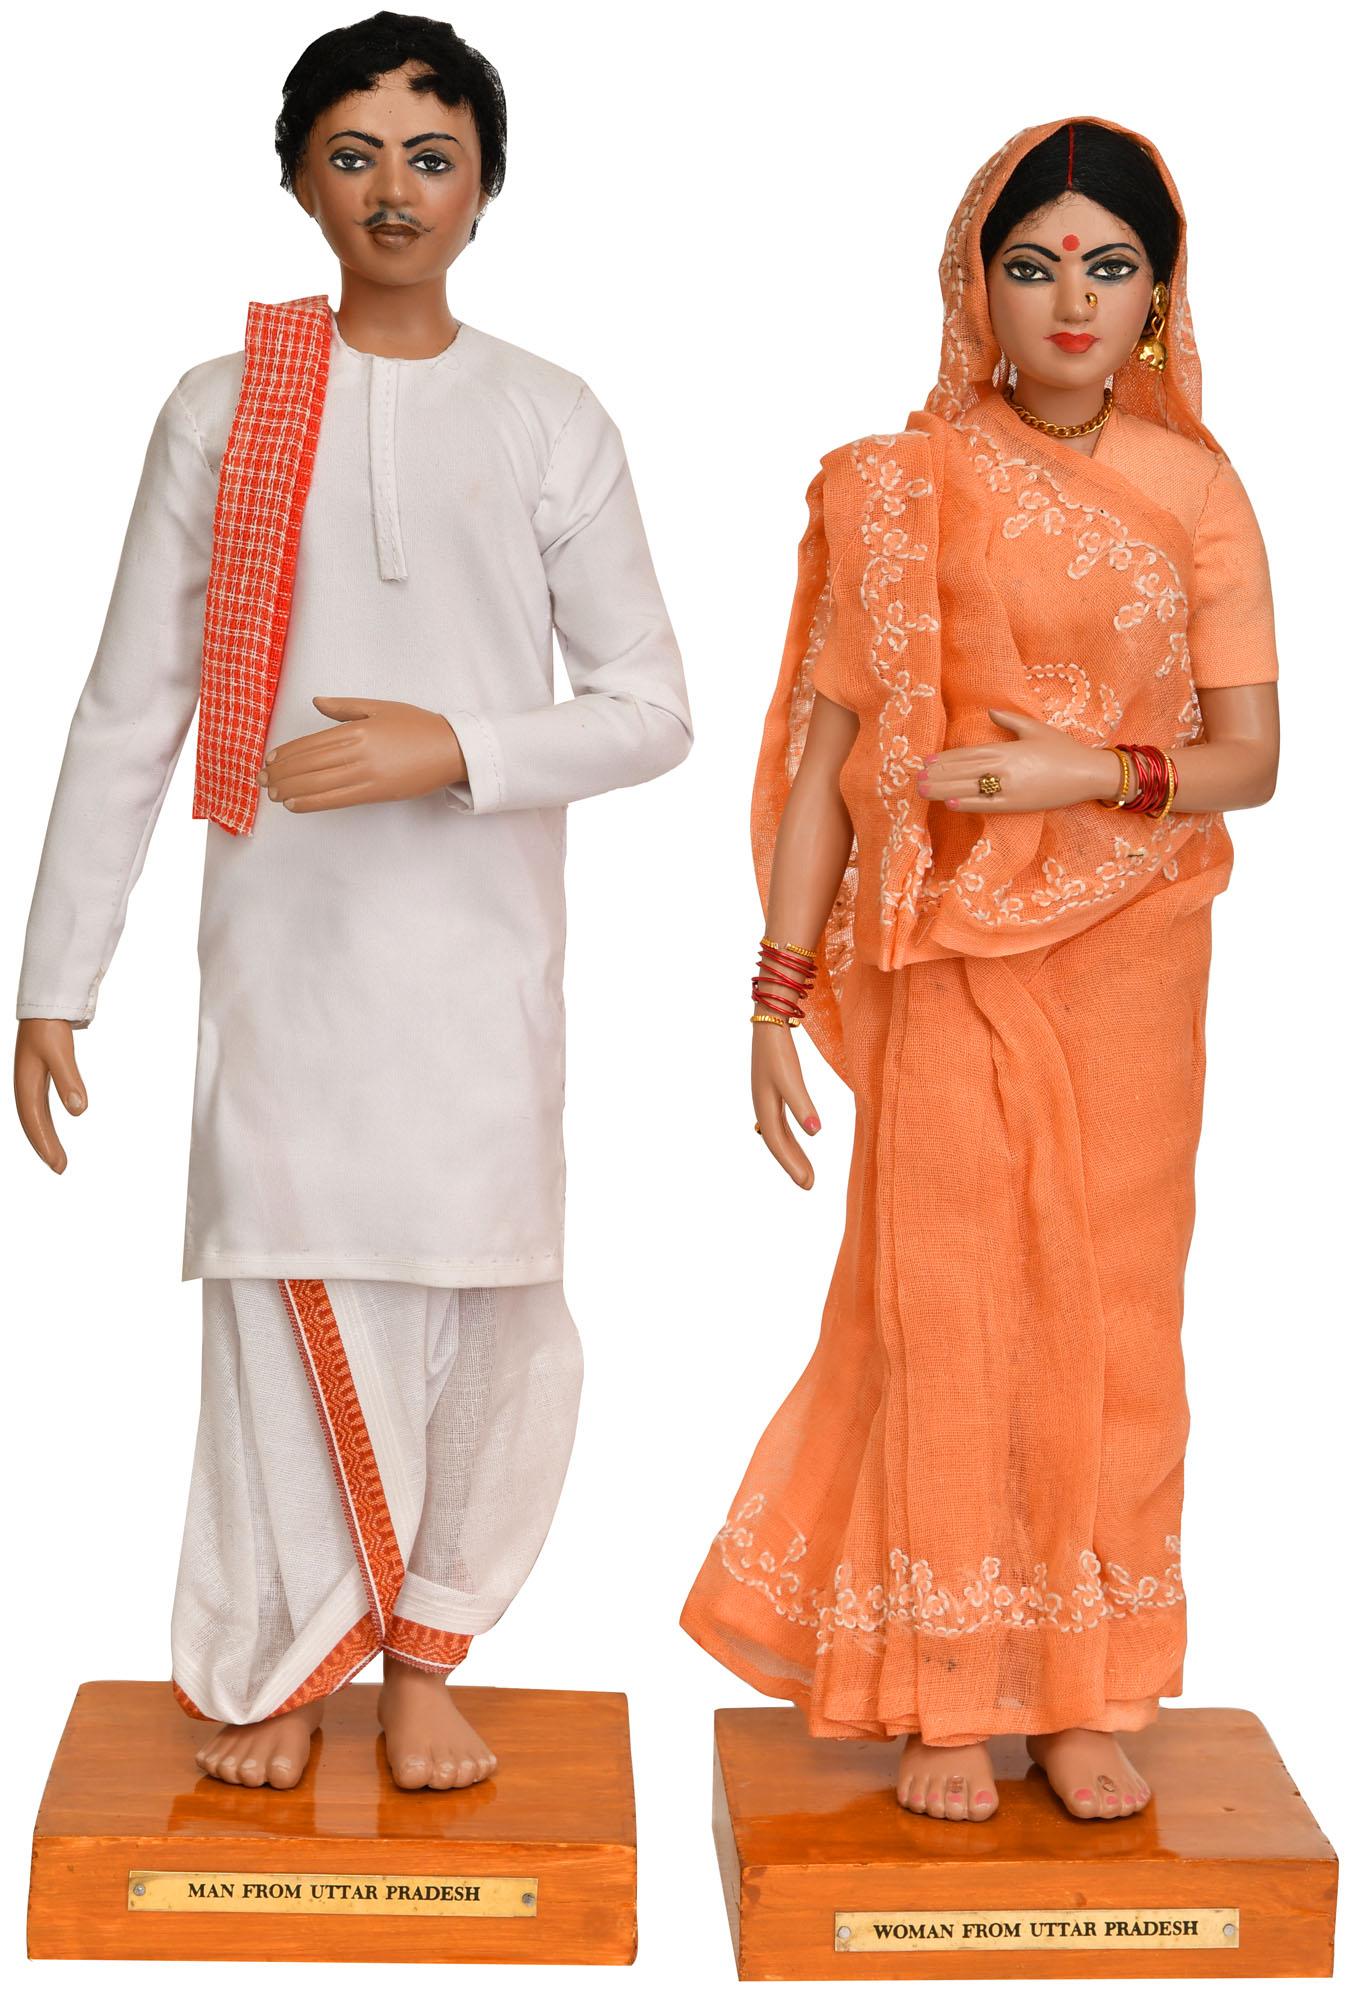 Man And Woman From Uttar Pradesh